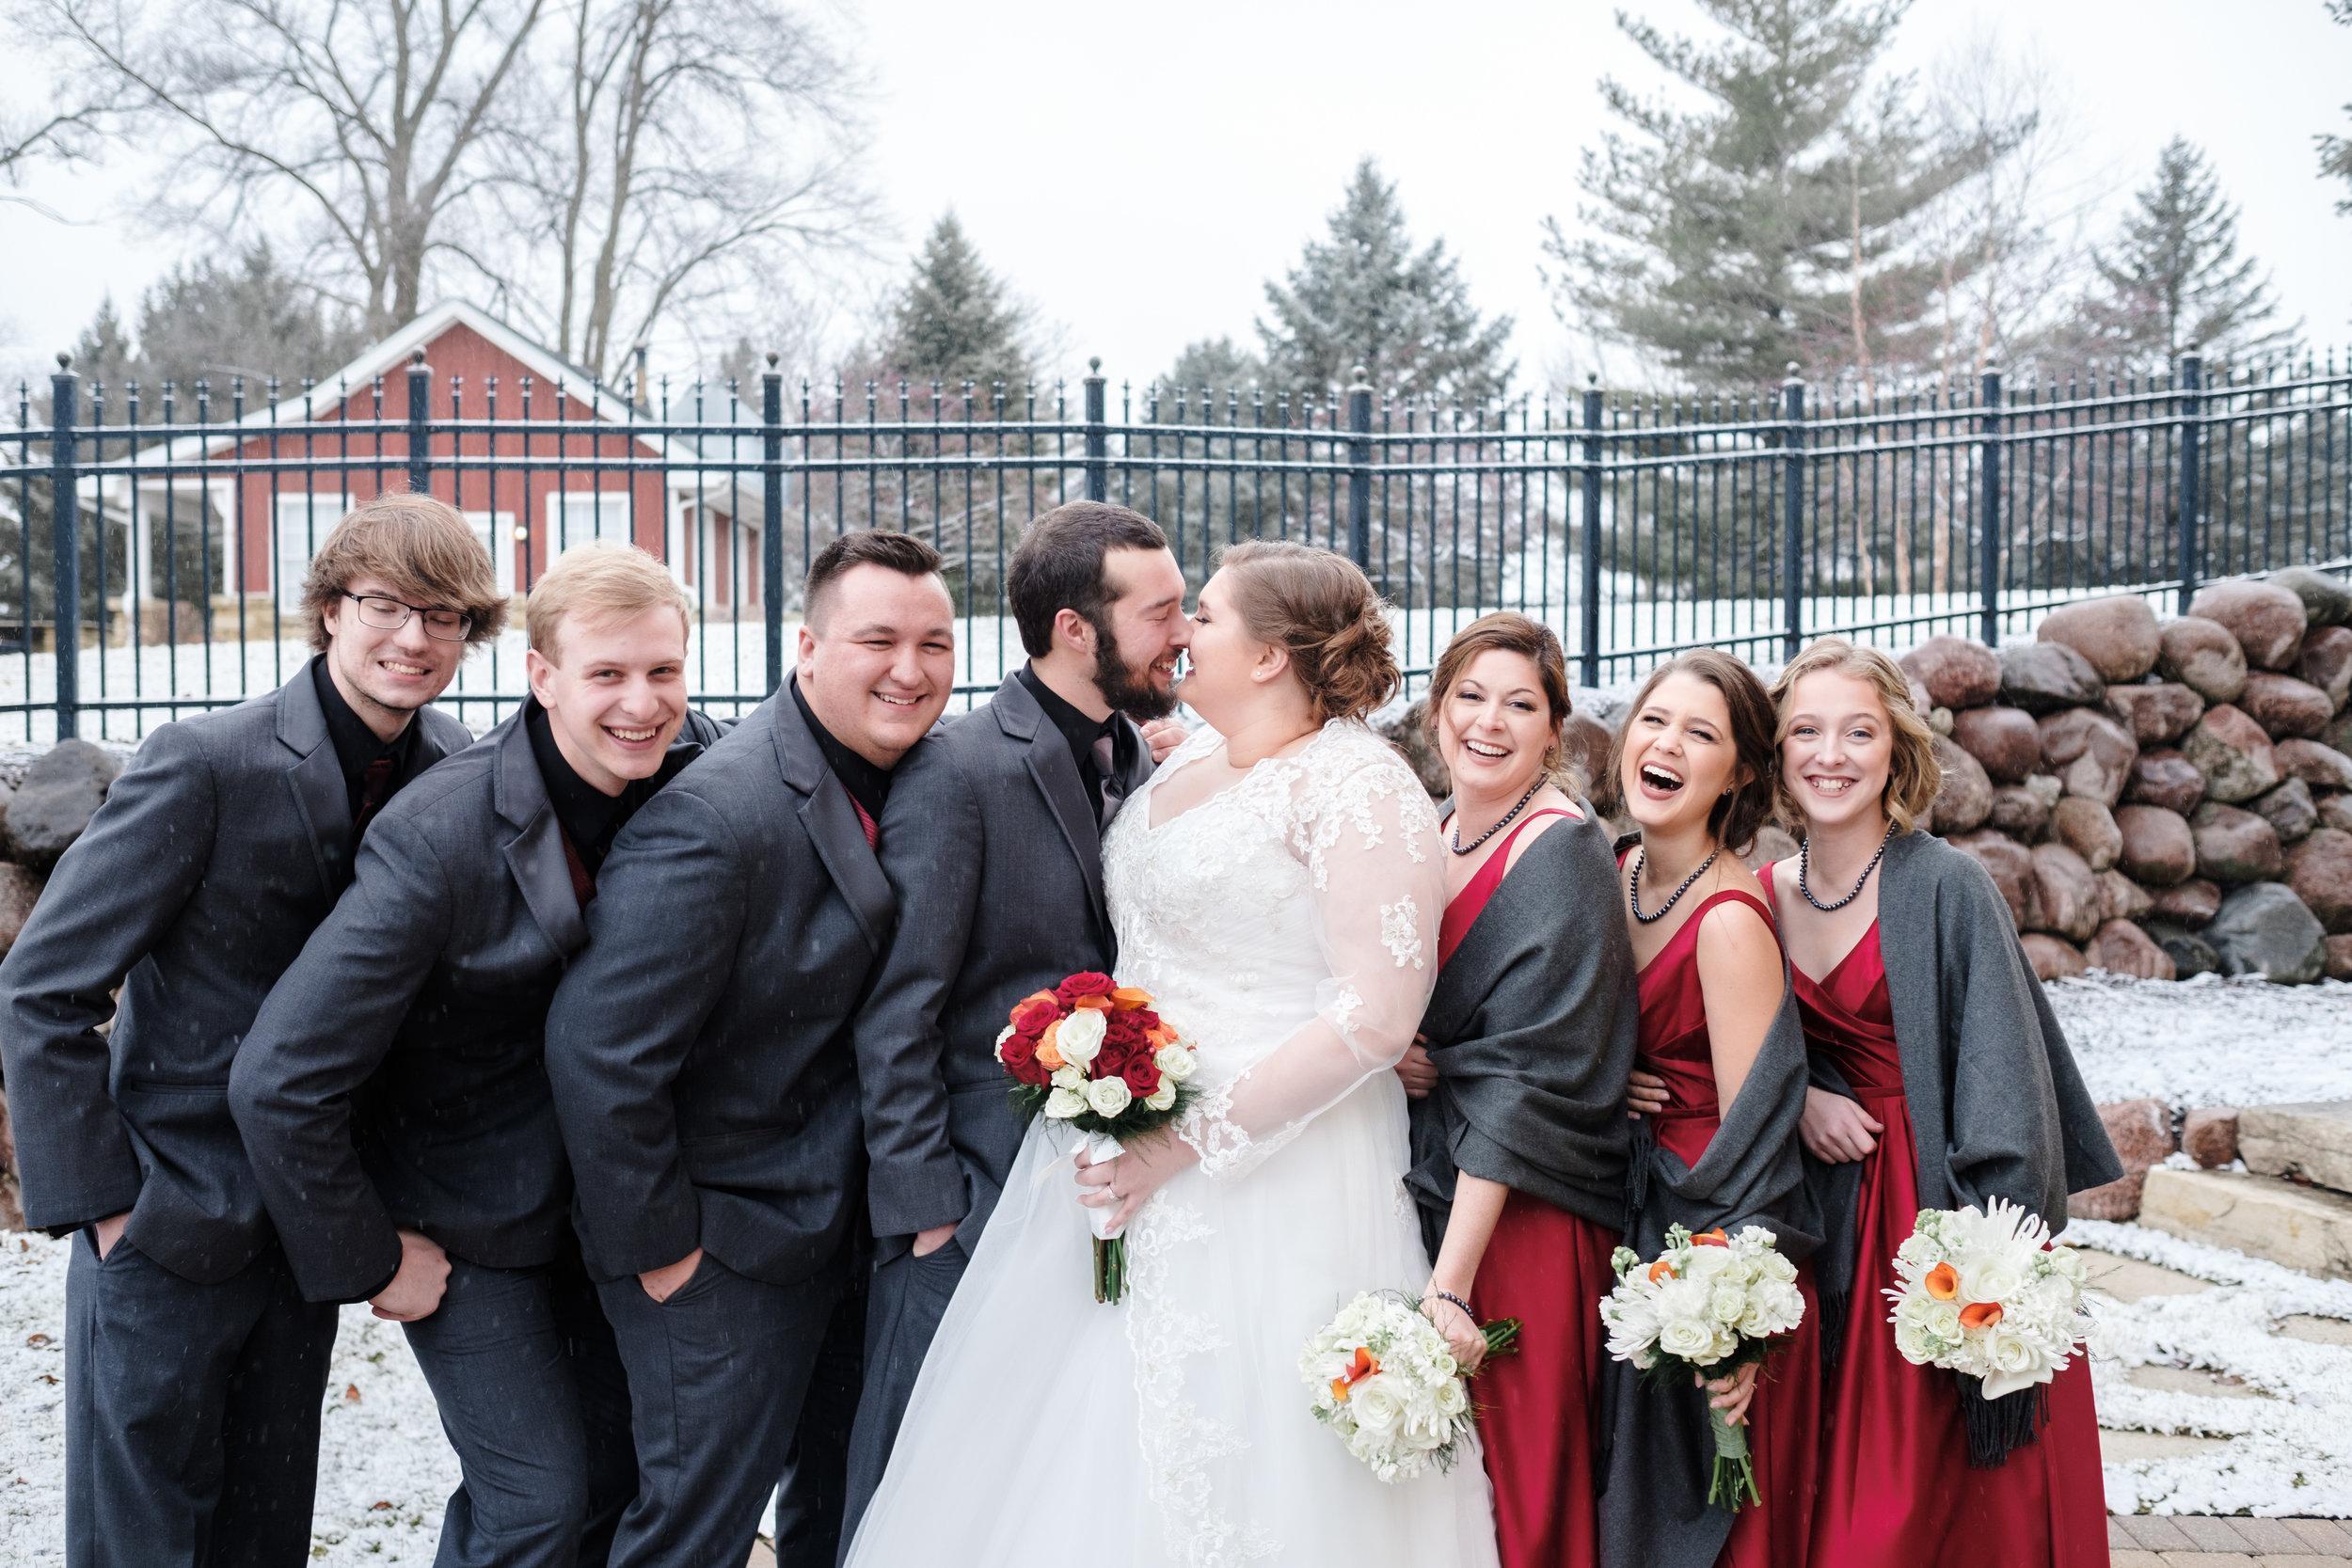 18-12-28 Corinne-Henry-Pavilion-Wedding-162.jpg